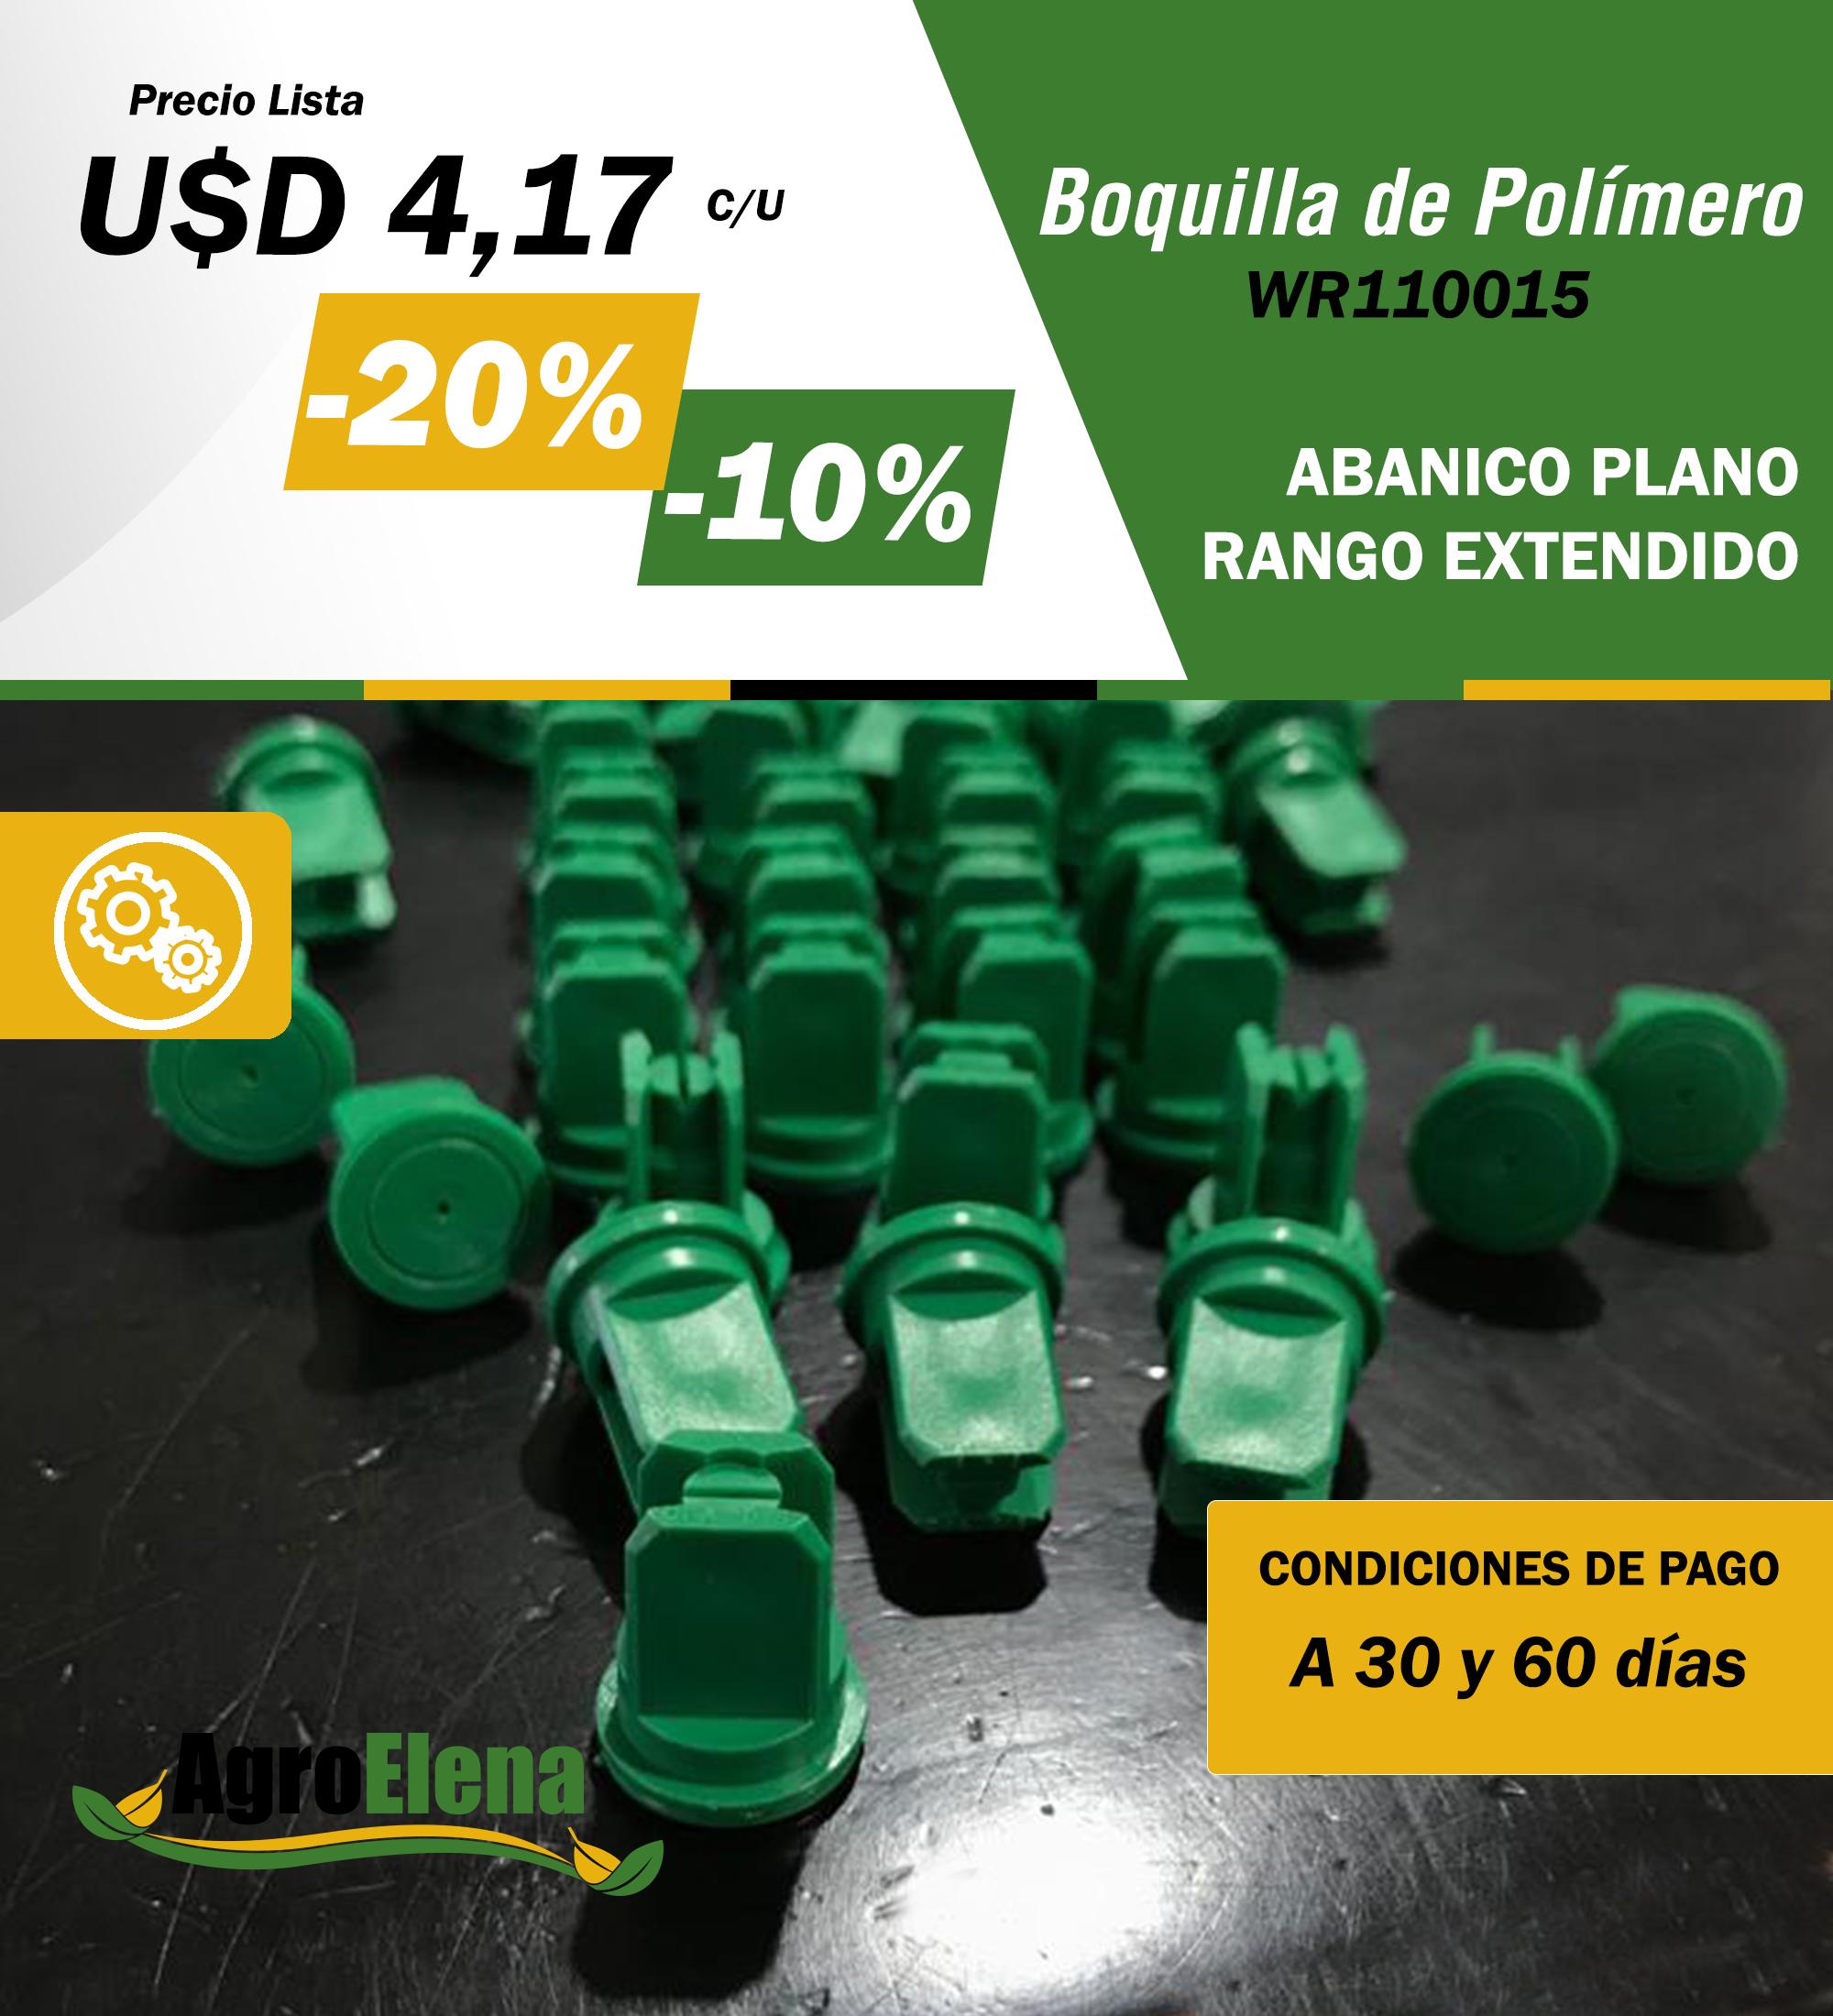 BOQUILLA DE POLÍMERO Image